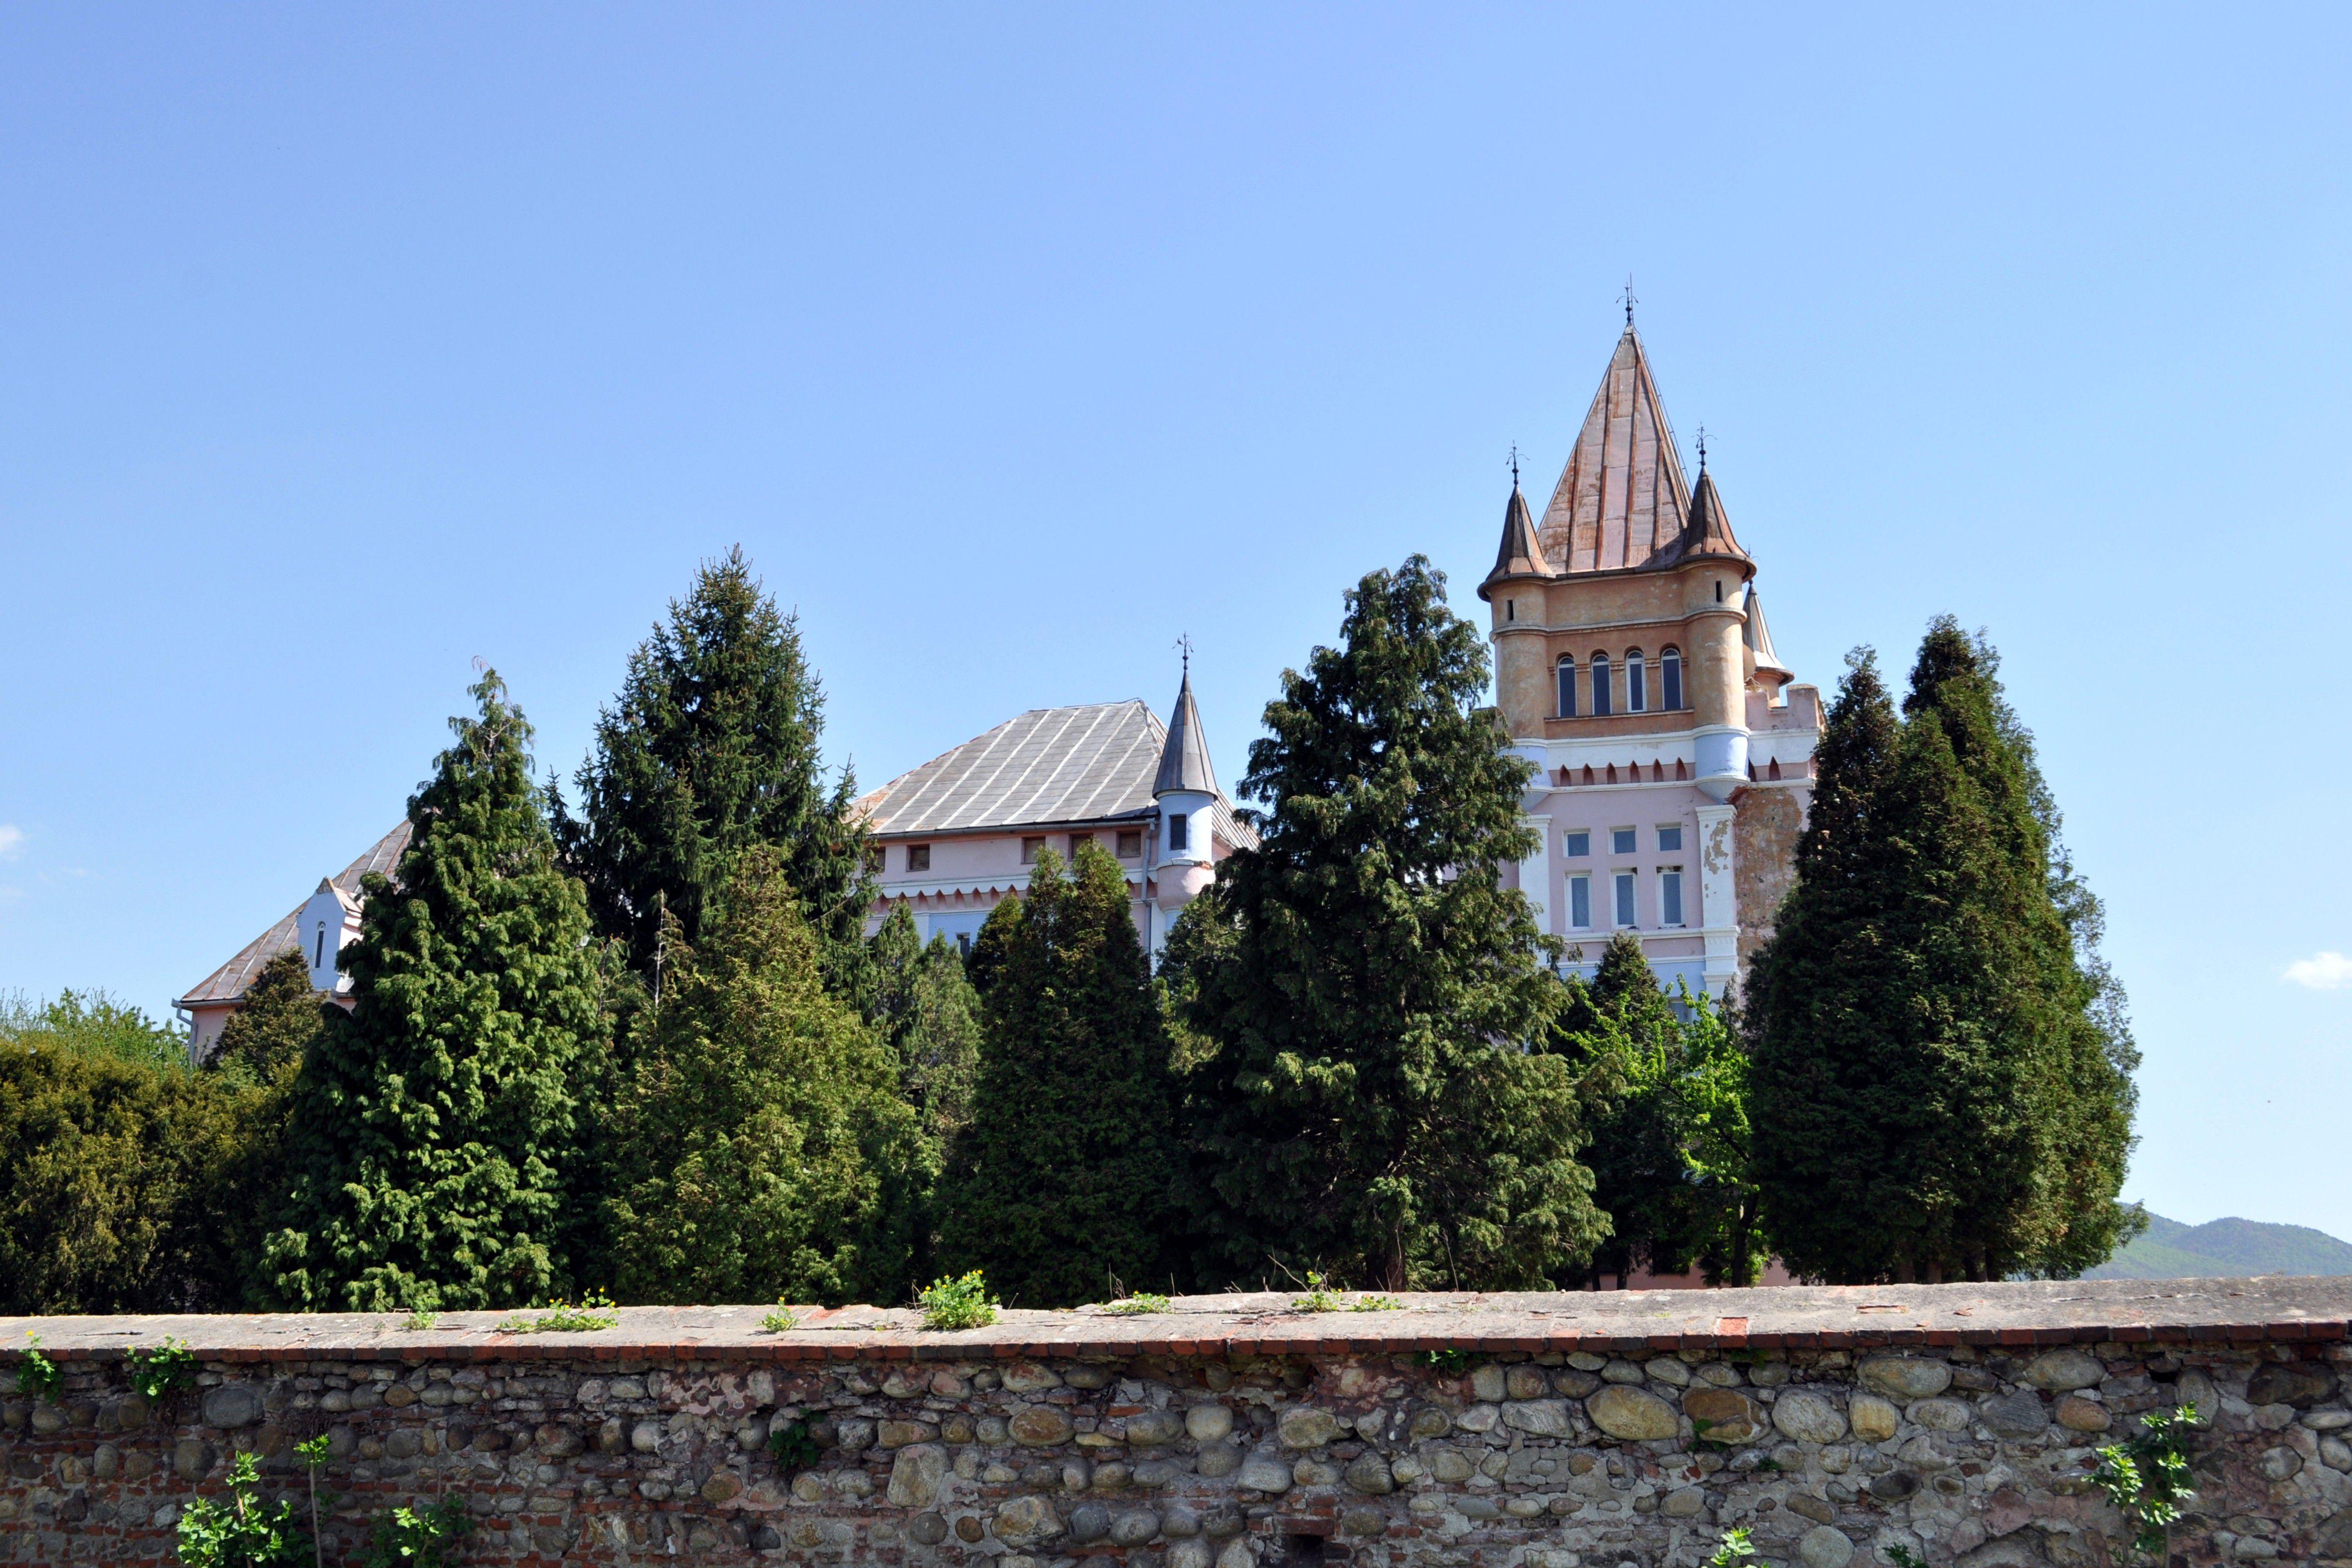 Castillo Kendeffy rodeado de árboles